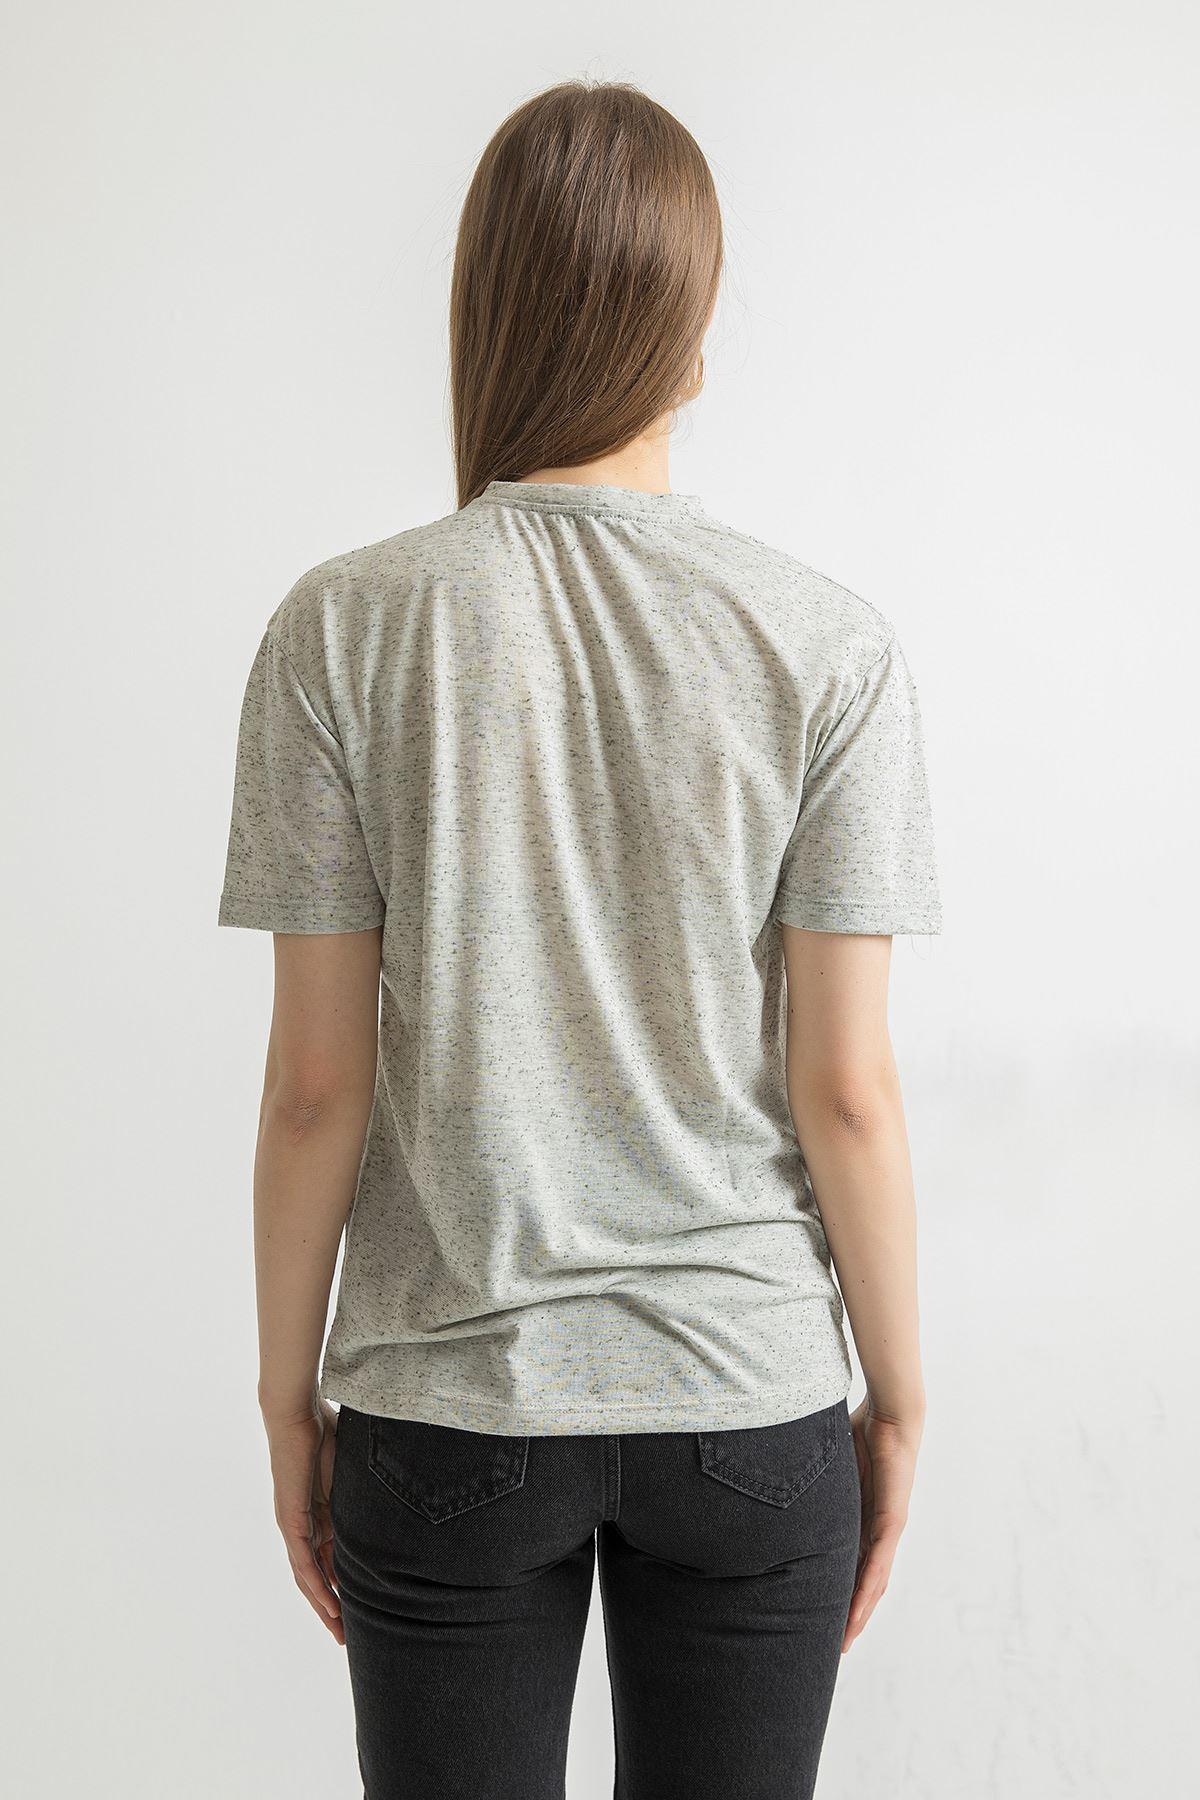 Stay Baskılı Salaş T-shirt-Antrasit